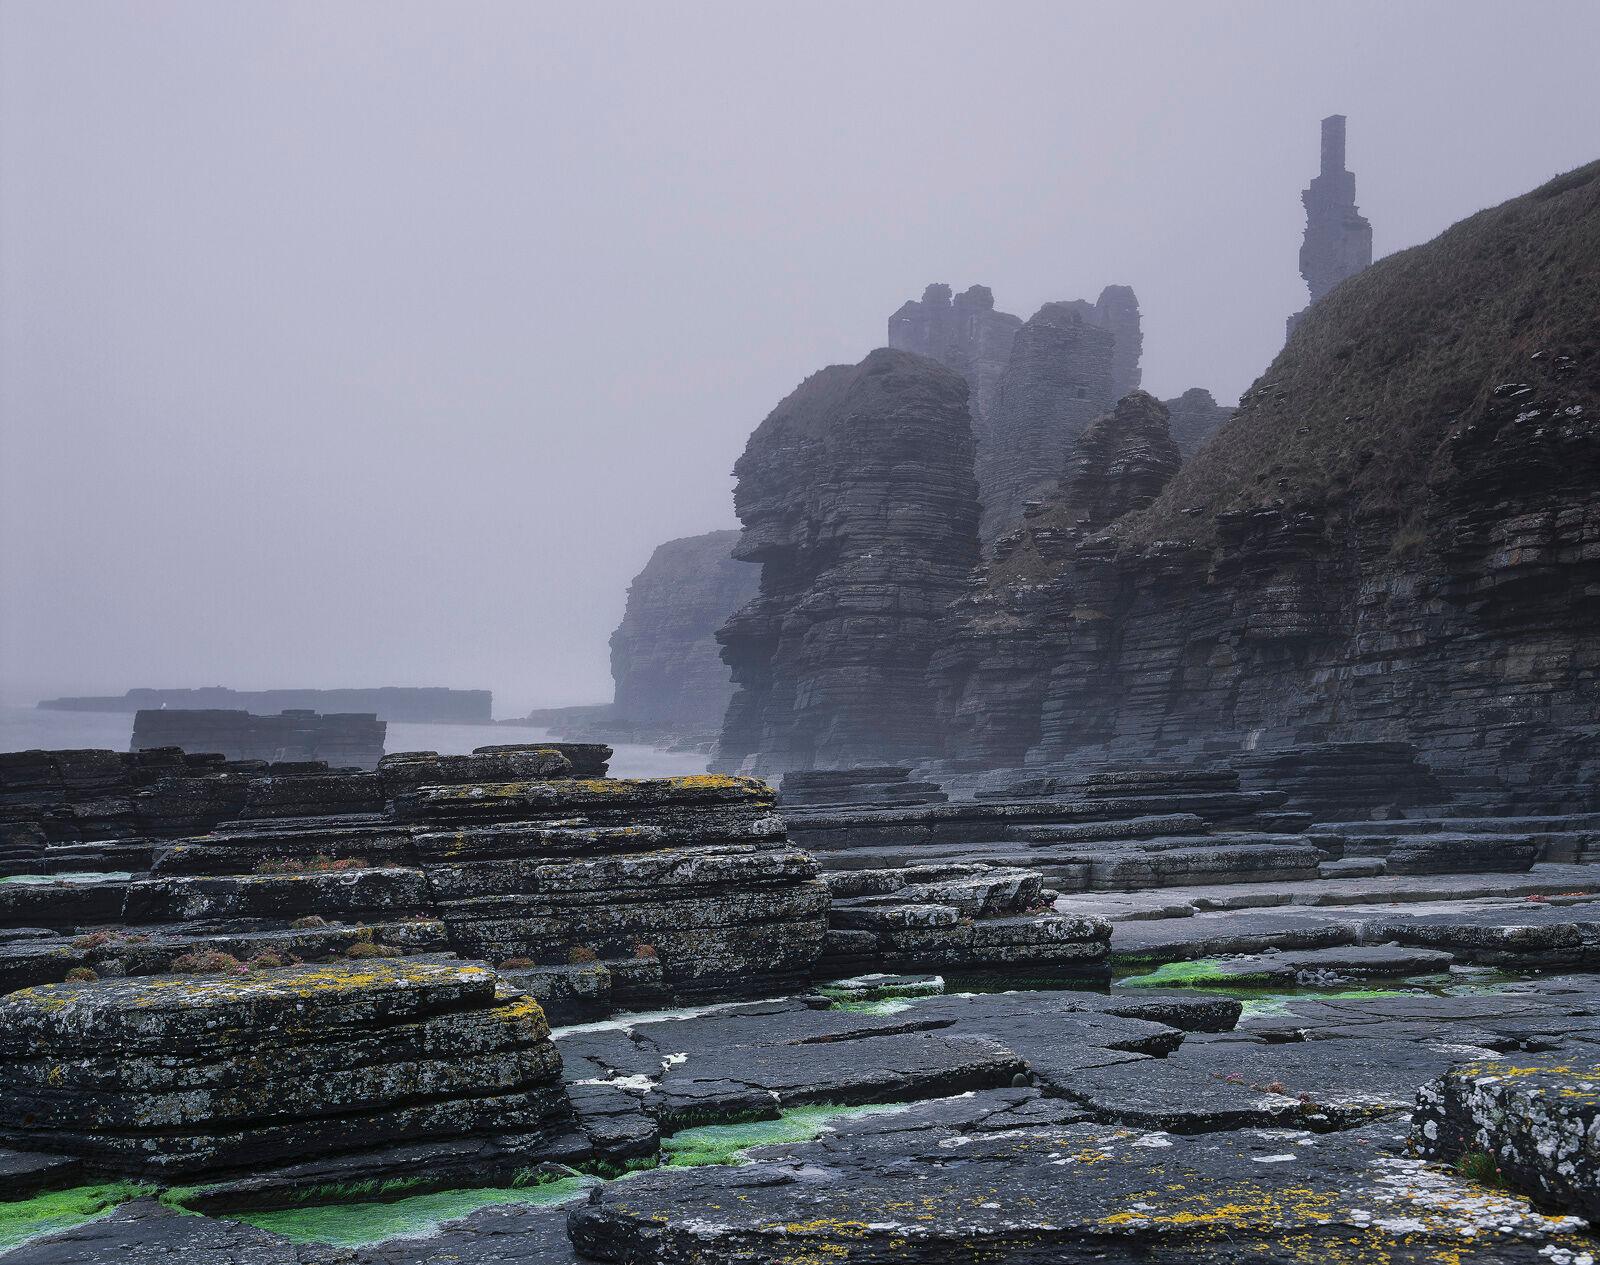 Misty Castle Girnigoe, Noss Head, Caithness, Scotland, lighthouse, Wick, ruined, castle, cliffs, cleaved, mist, rock, li, photo